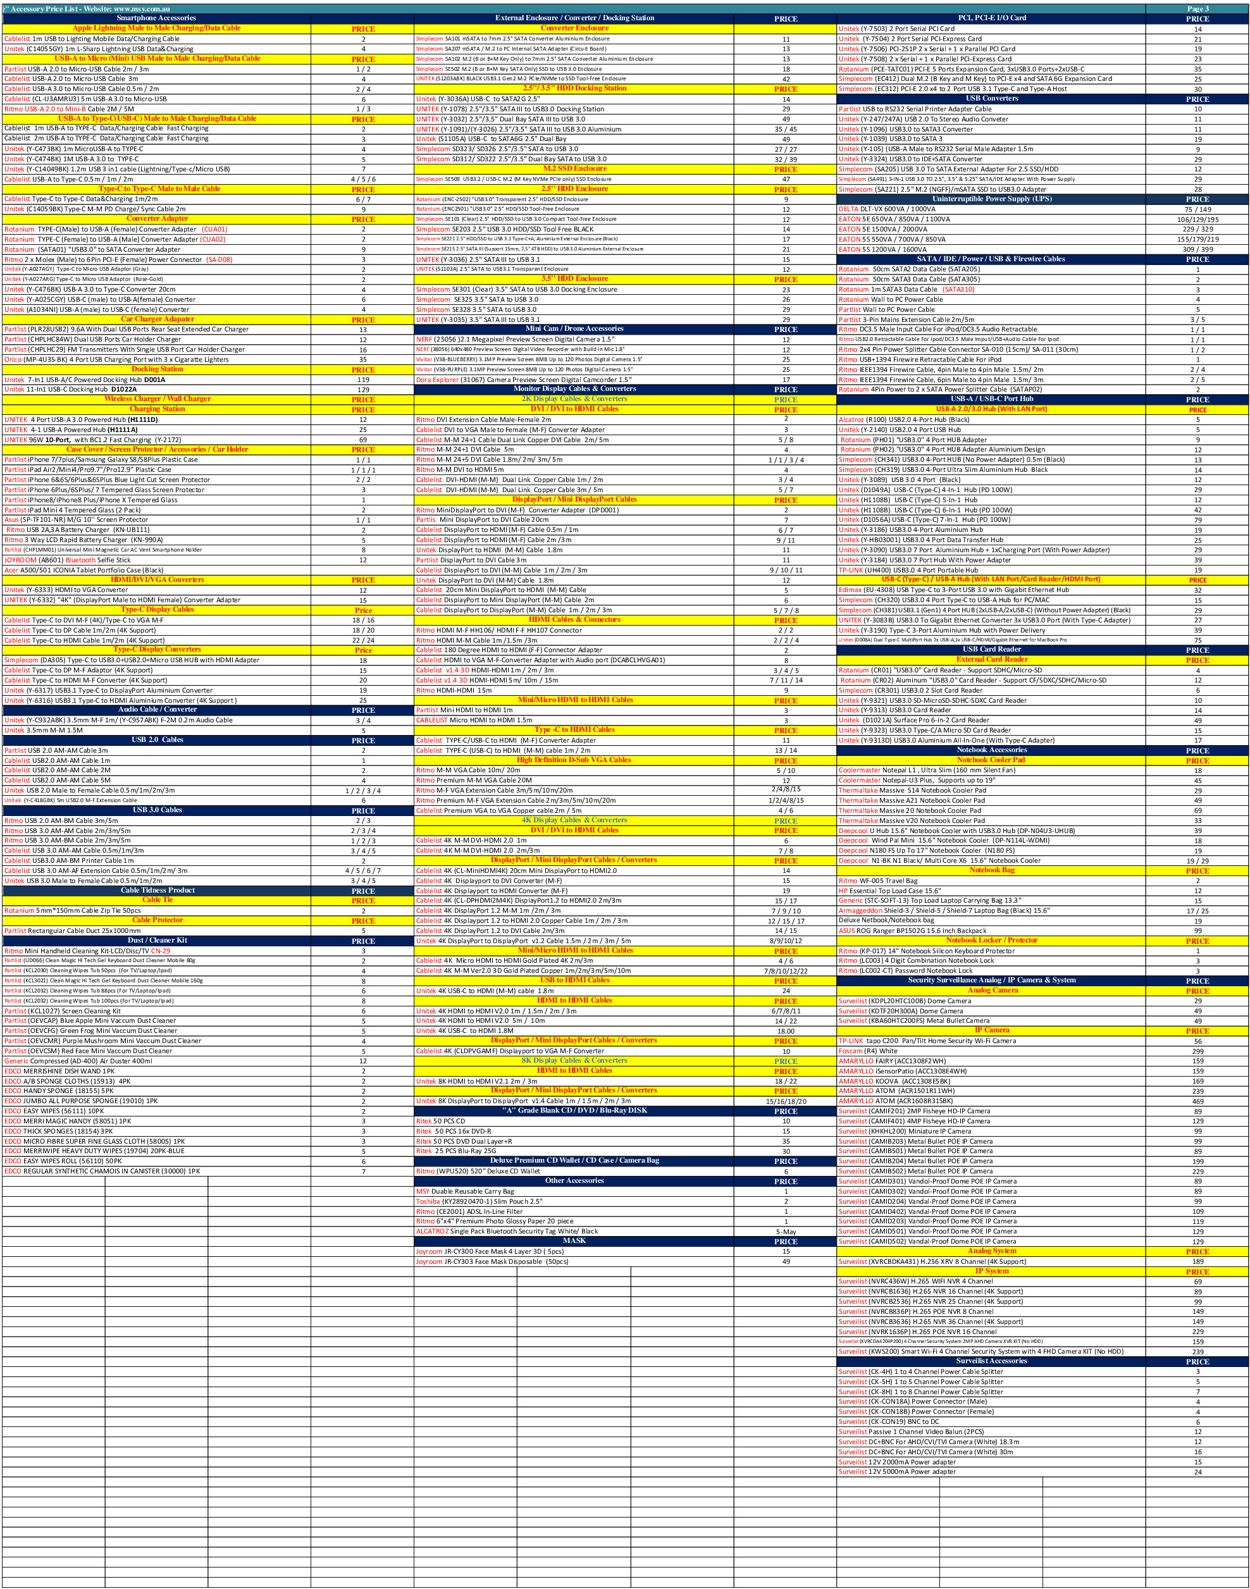 MSY Technology Catalogue - 04/03-04/03/2021 (Page 3)